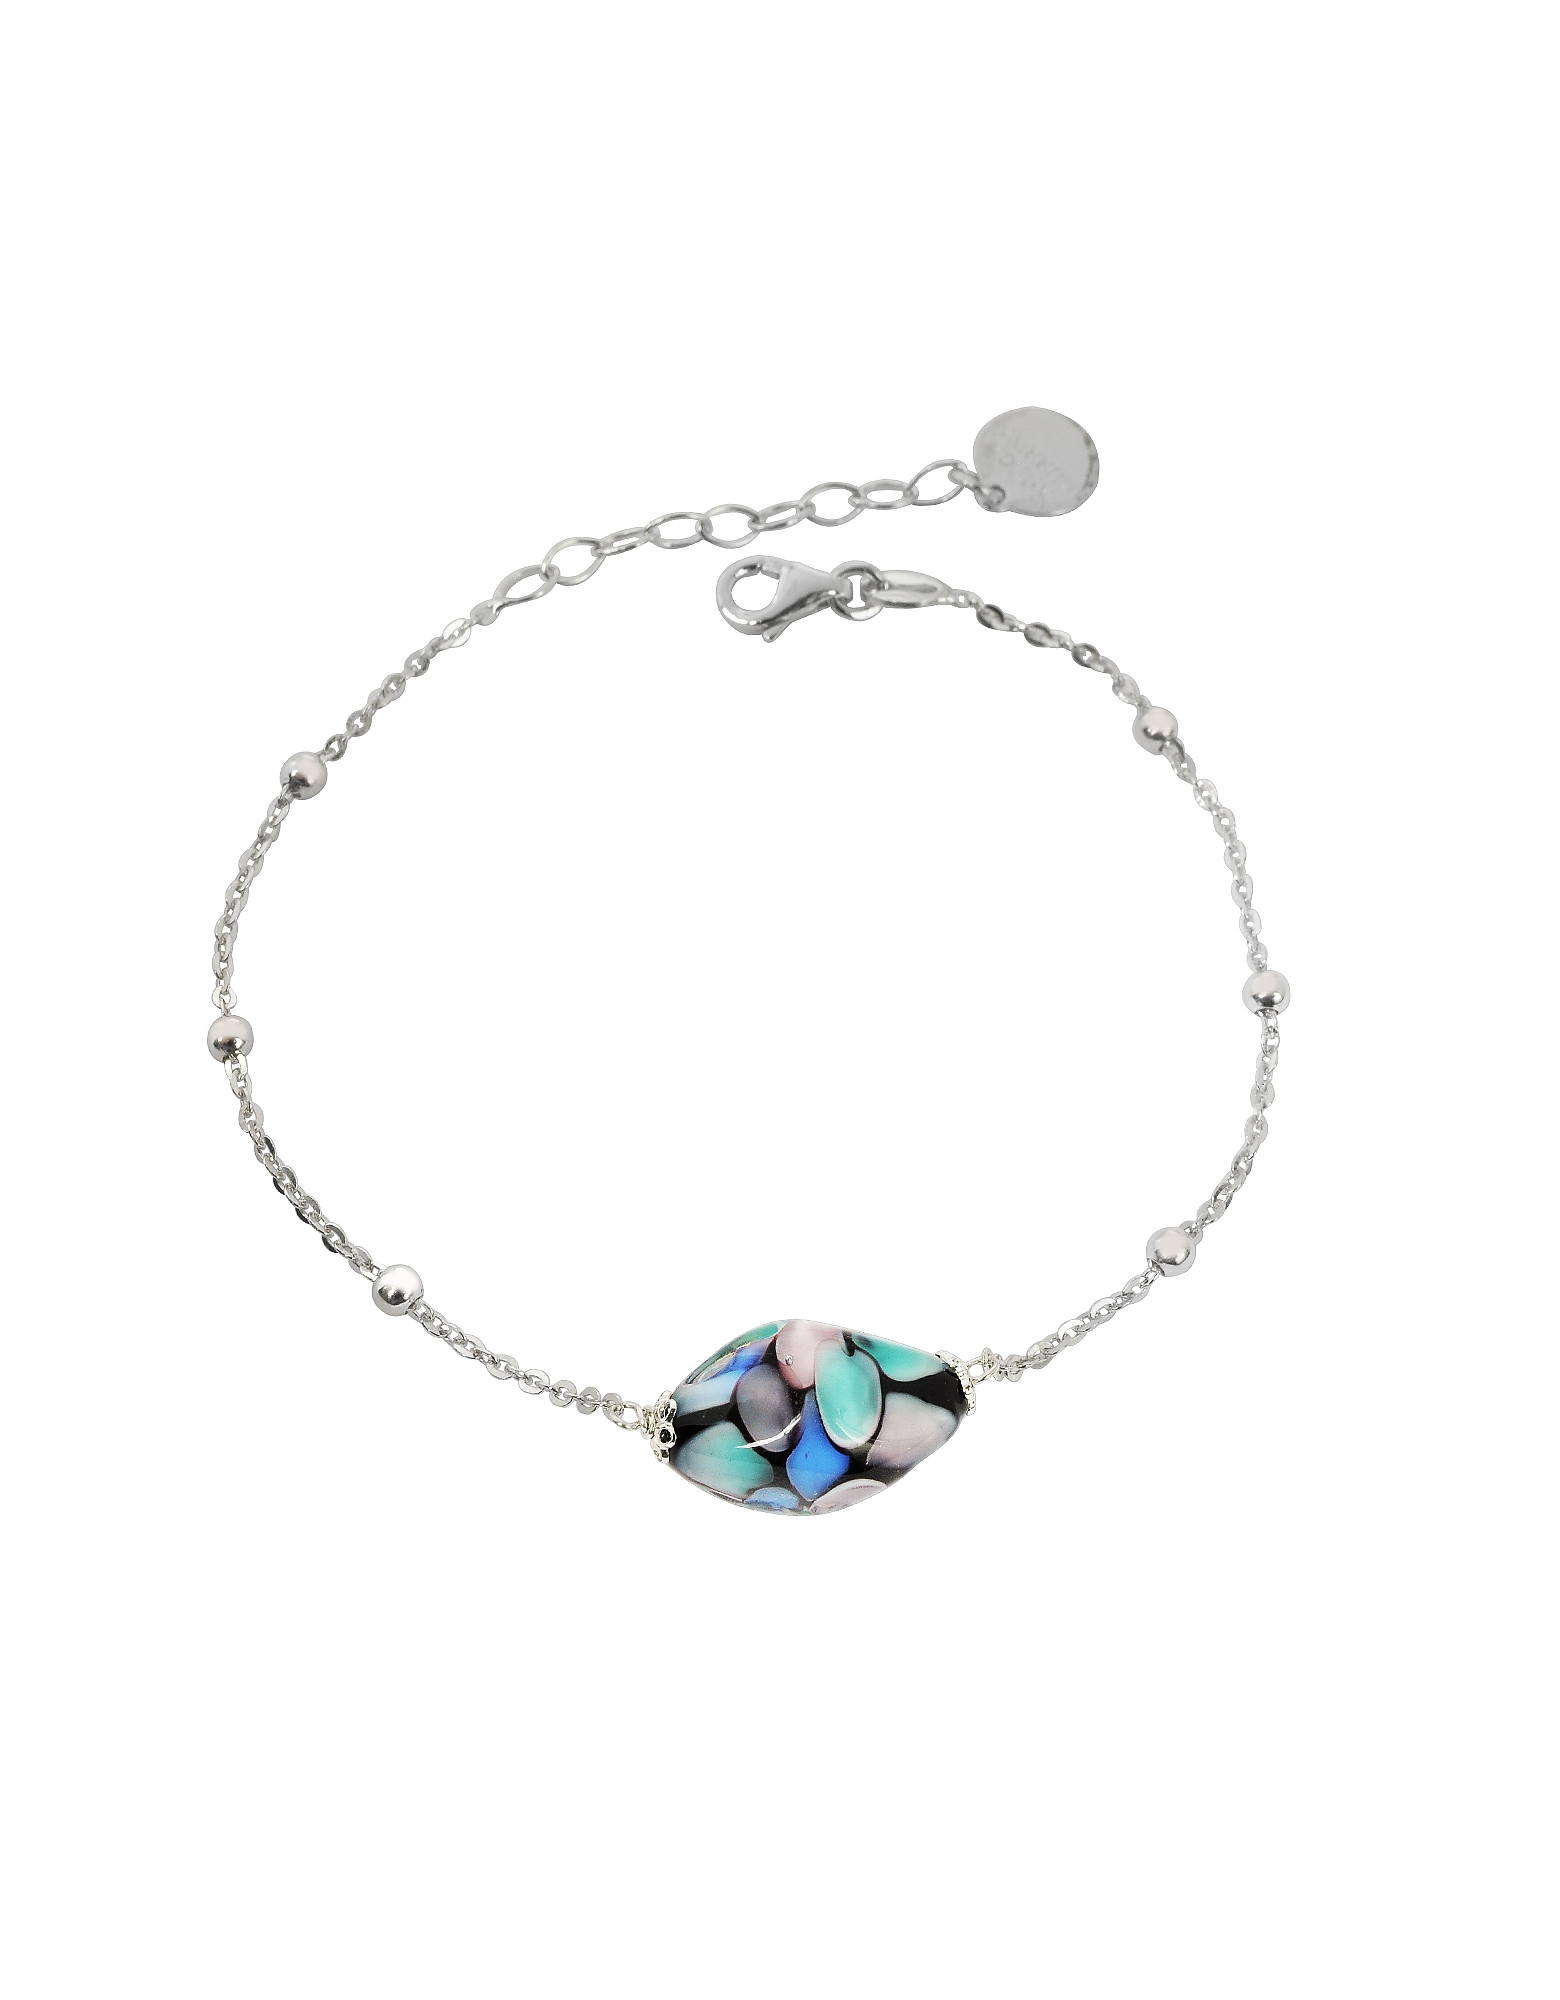 Antica Murrina Bracelets, Smeralda Glass Beads Sterling Silver Bracelet